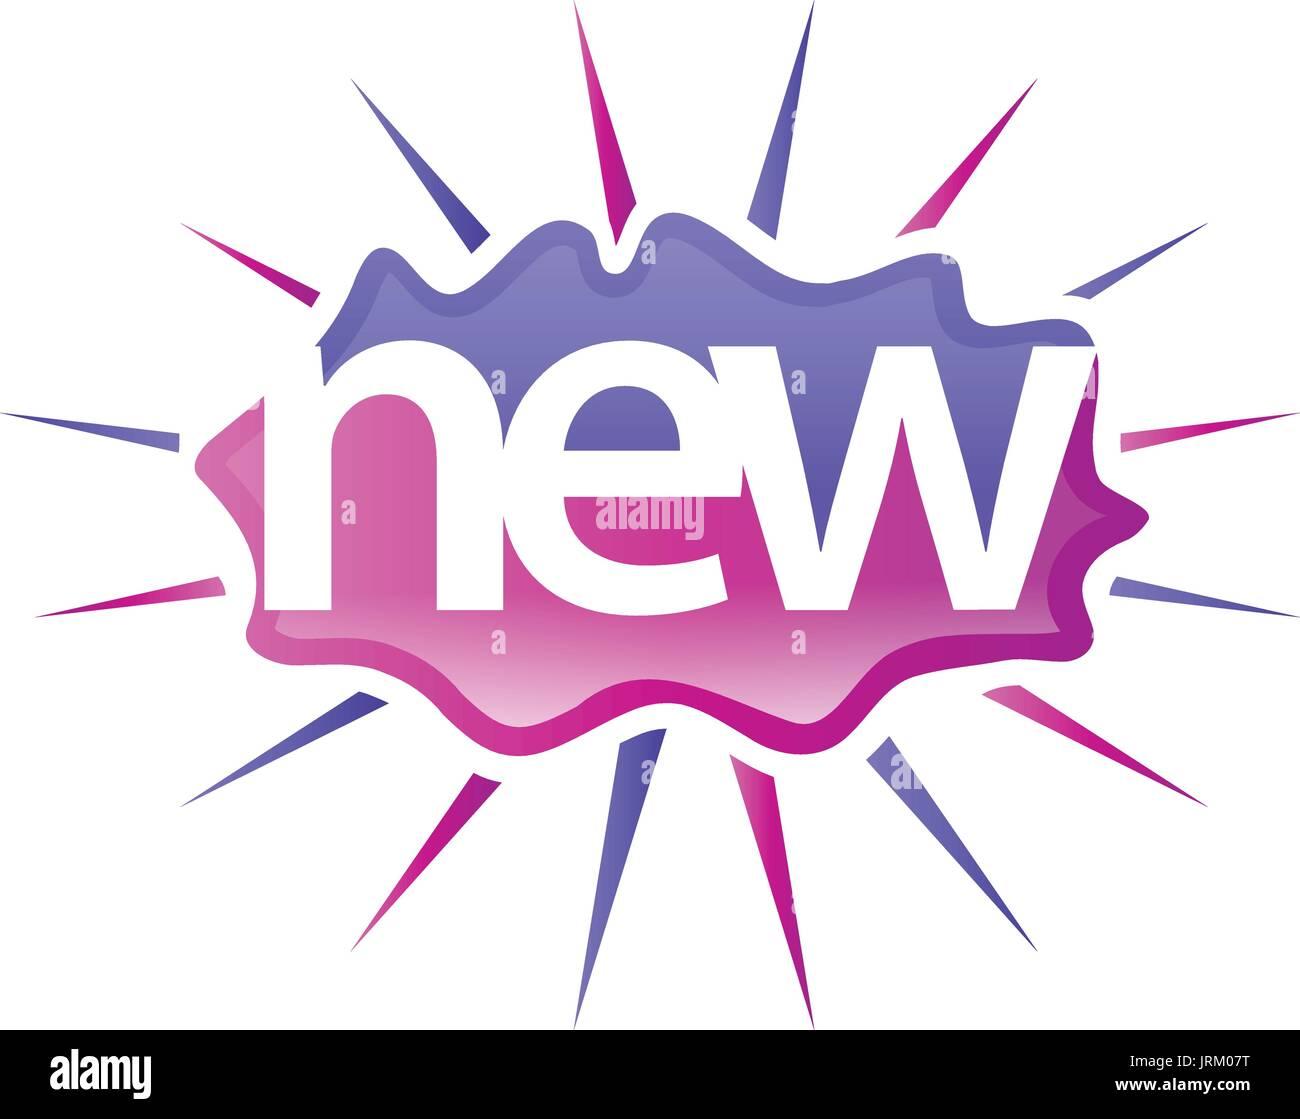 playful new word with shines, illustration design, isolated on white background - Stock Image